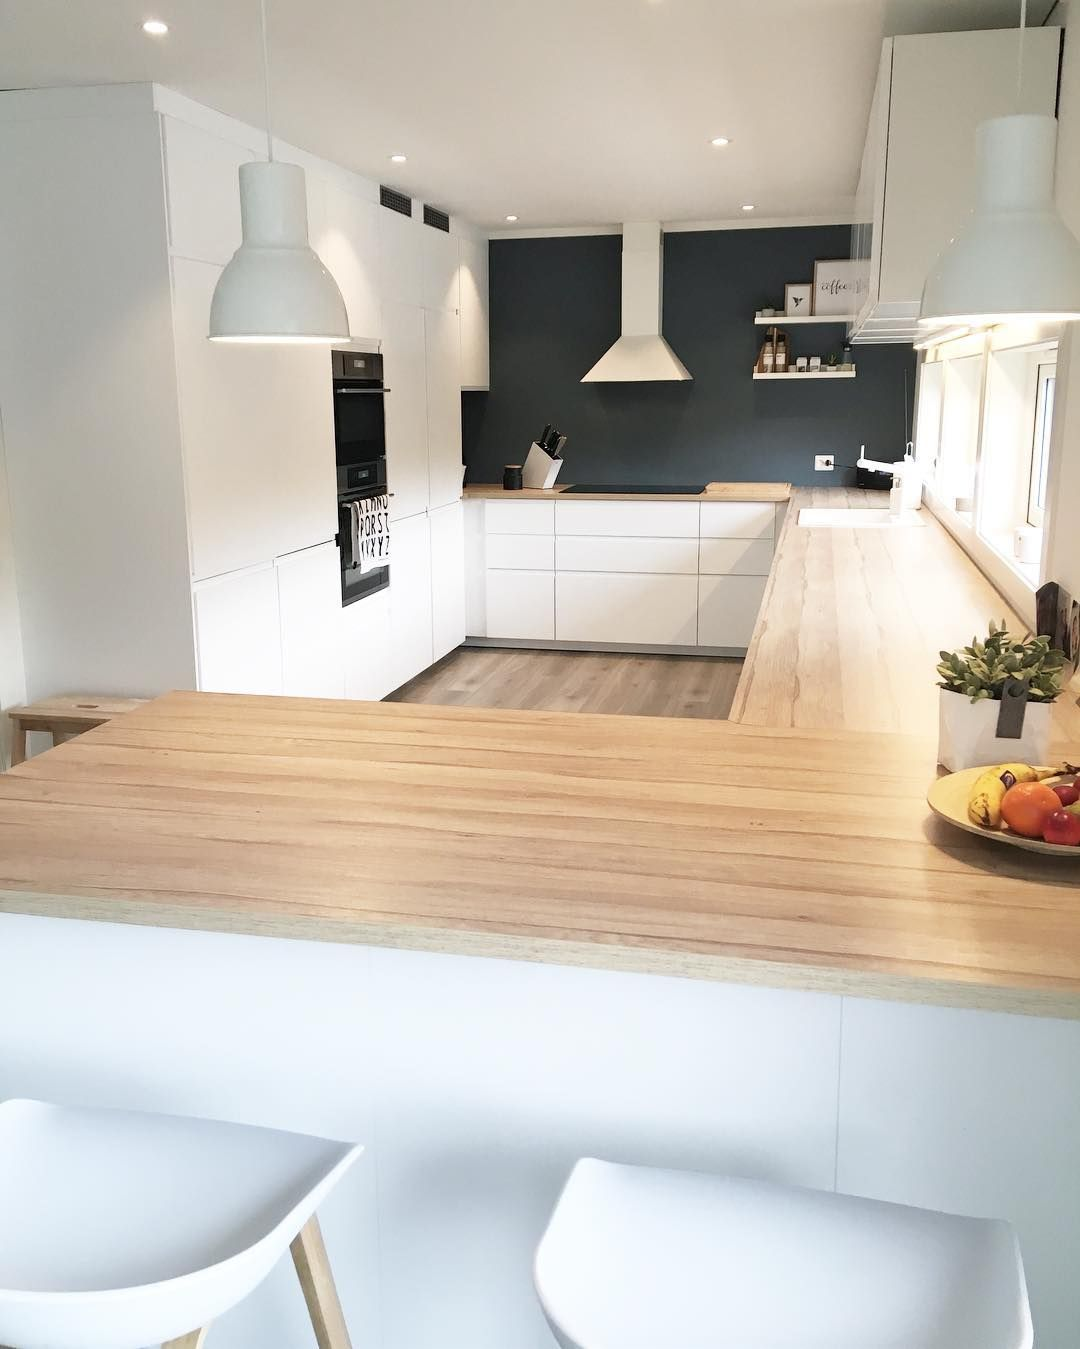 Susannegaupeland on instagram kj kken voxtorp for Ikea cucina bianca